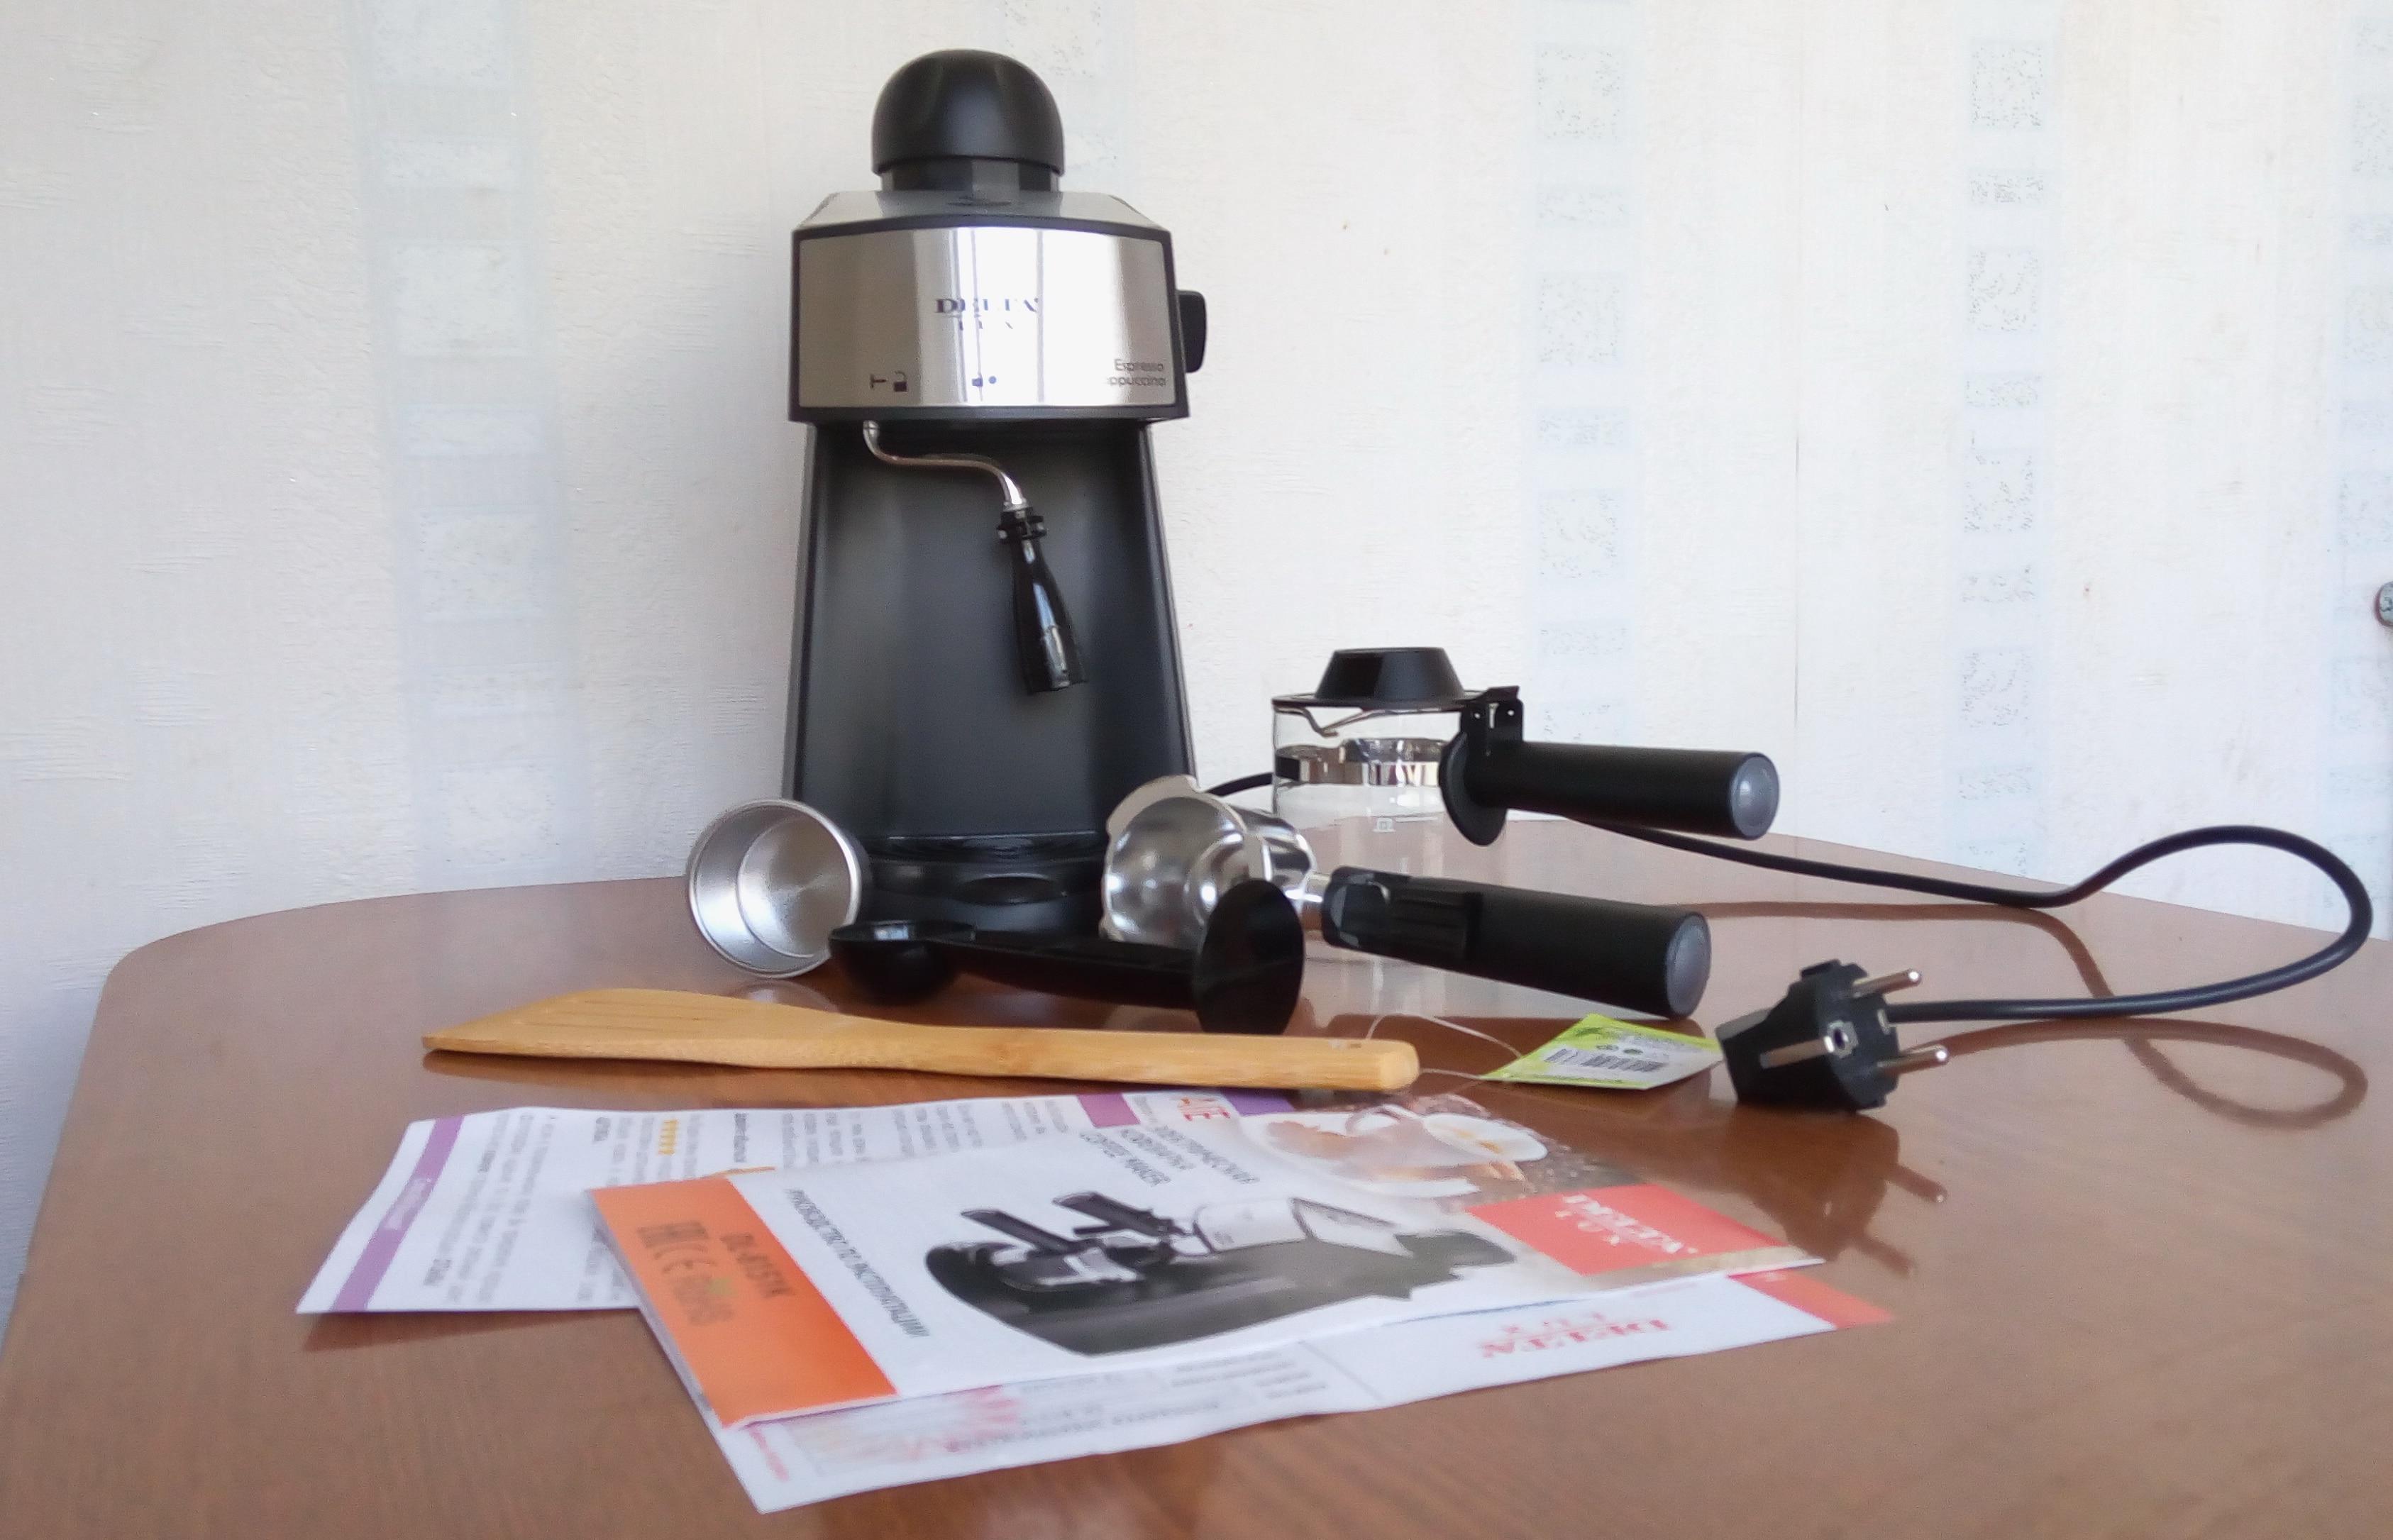 DL-8151K Coffee maker machine, cafe household, semi automatic, espresso cappuccino latte maker 5 bar